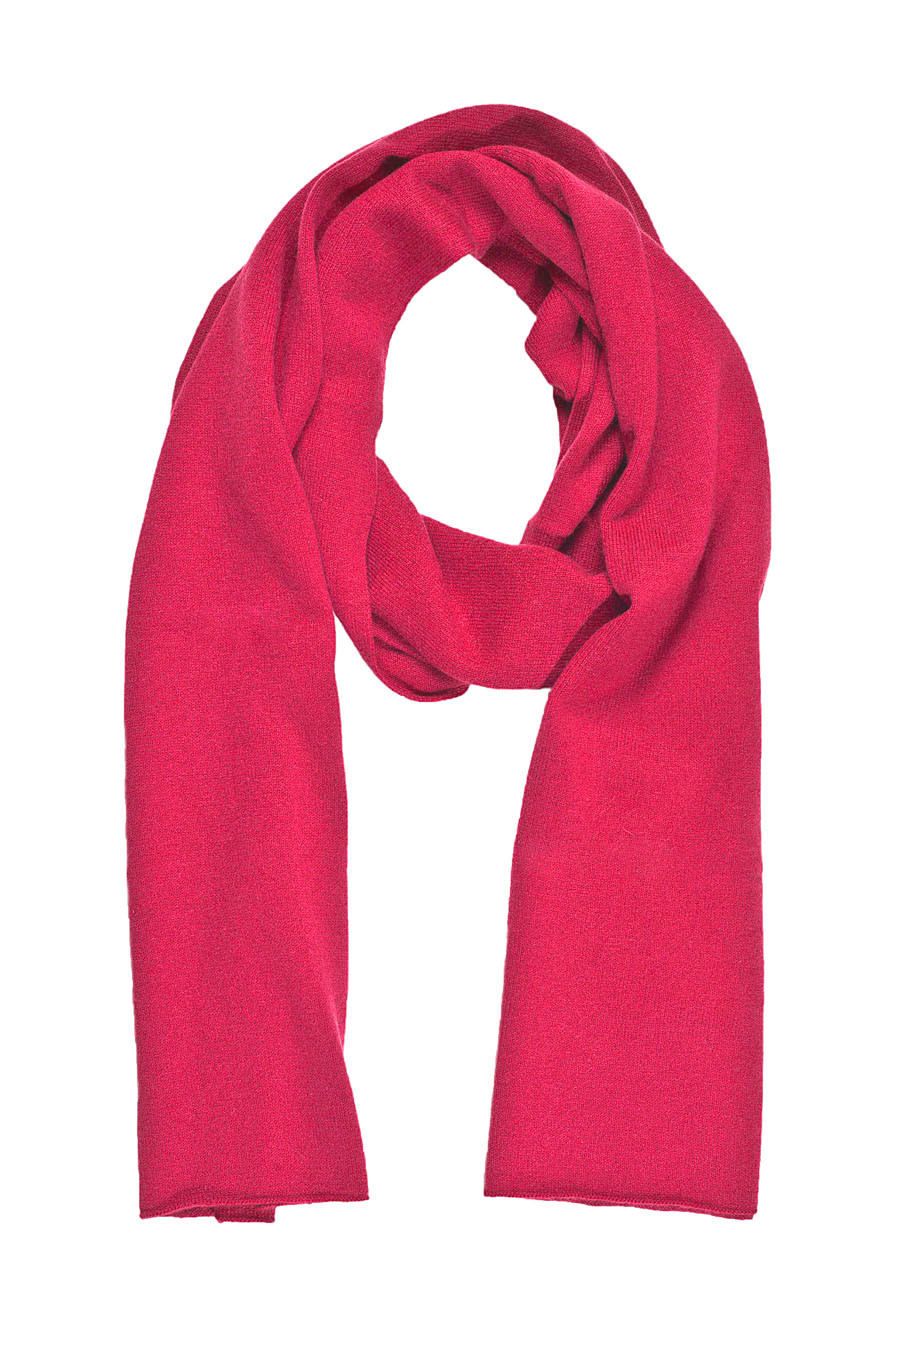 Echarpe cachemire NIKEA-rose-framboise